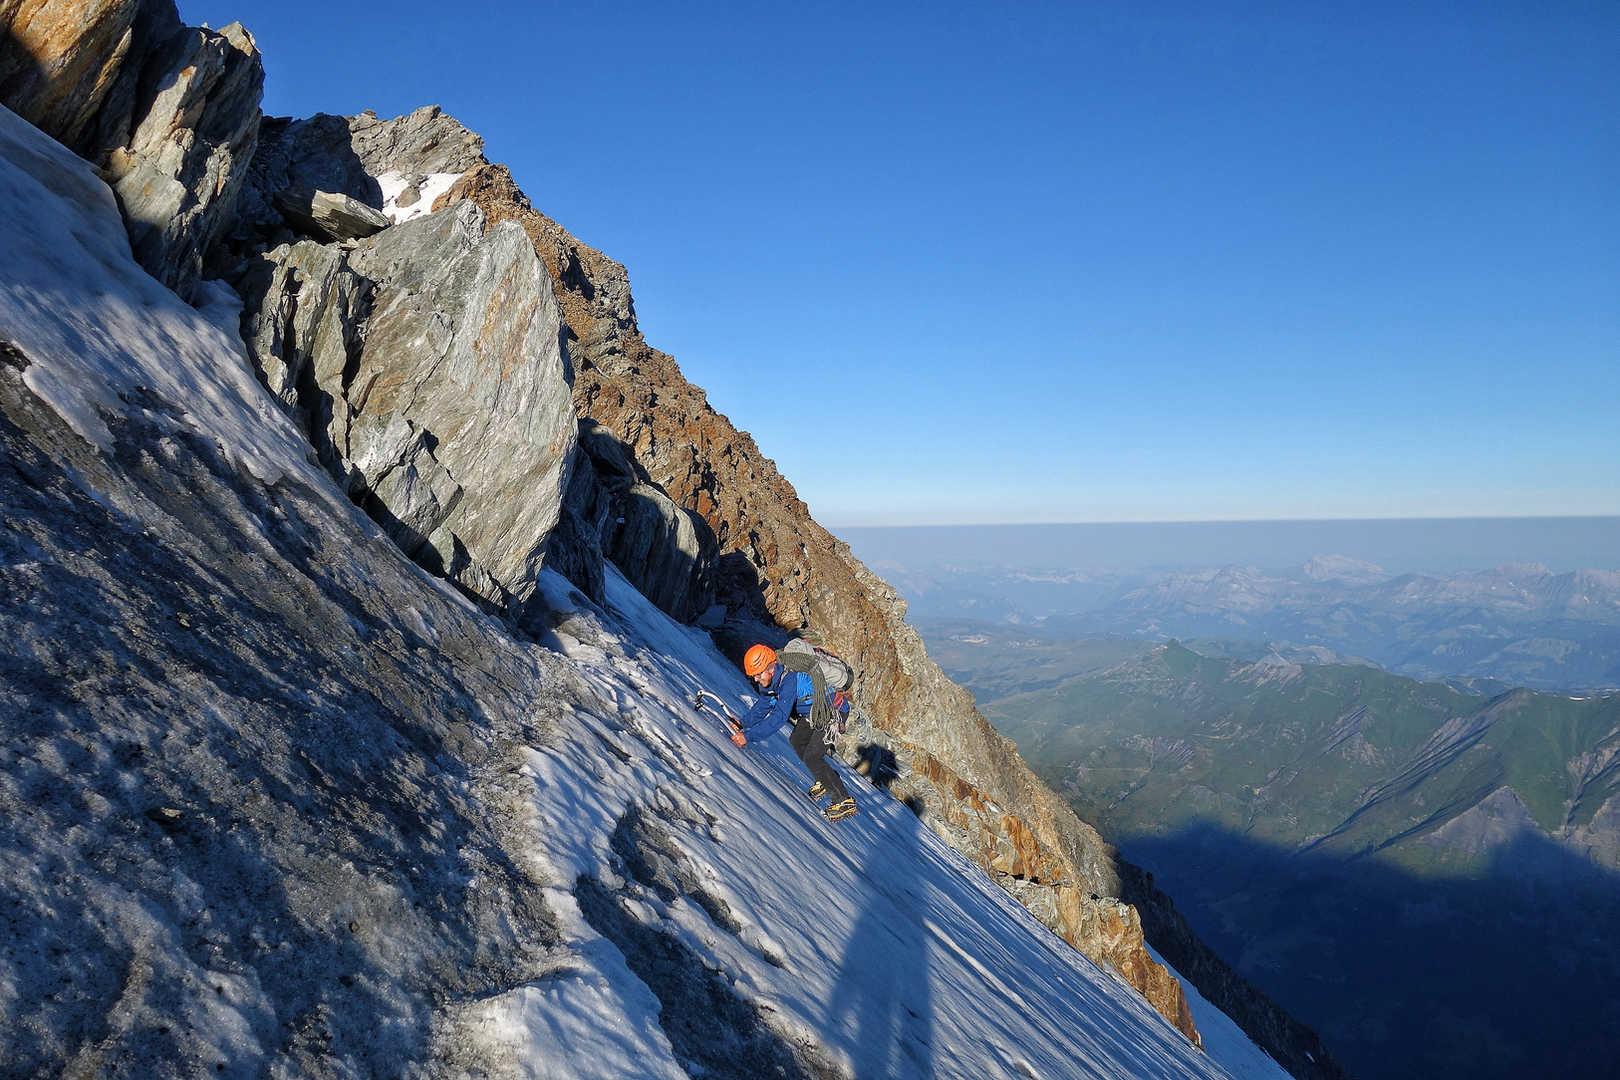 Übergang vom Fels ins Eis - Dome du Miage